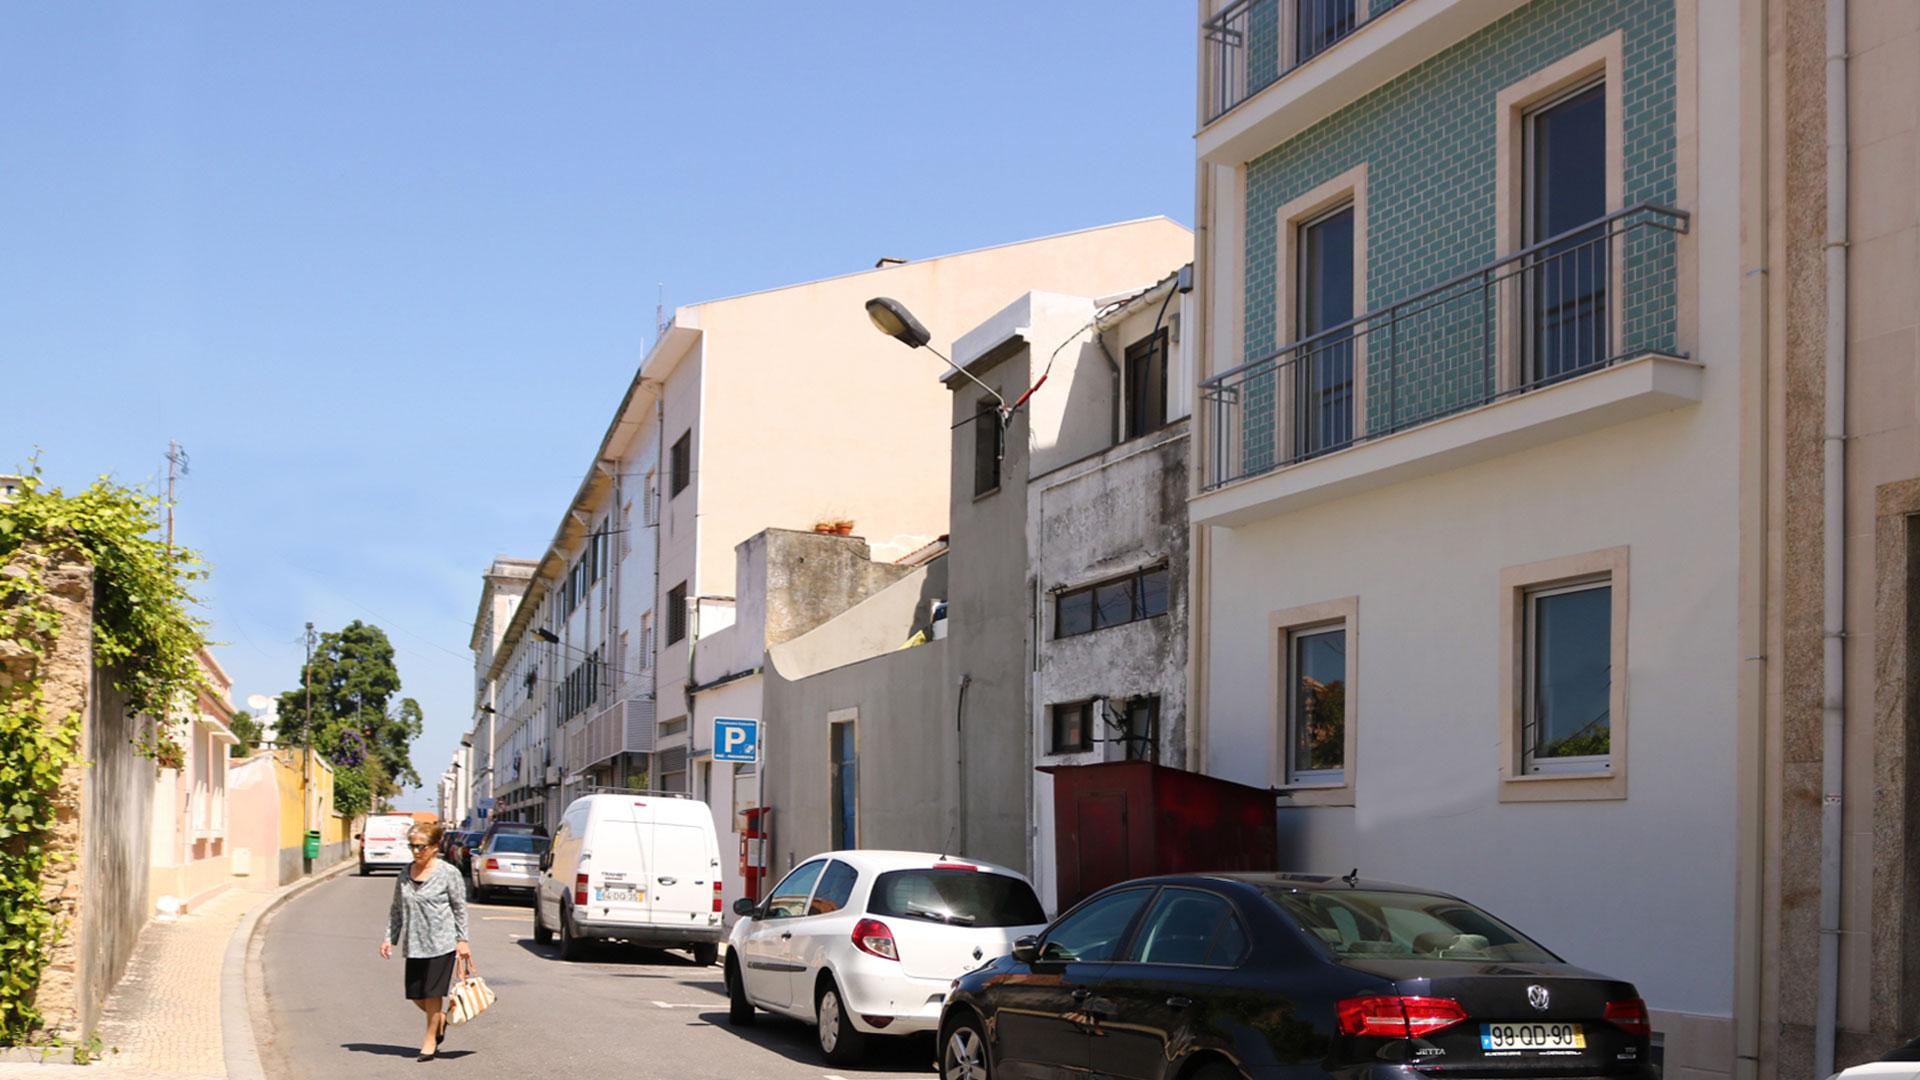 Alboi-Aveiro-ville-real-estate-imobiliaria-comprar-arrendar-vender-moradia-apartamento-casa-t0-t1-t2-t3-t4-3